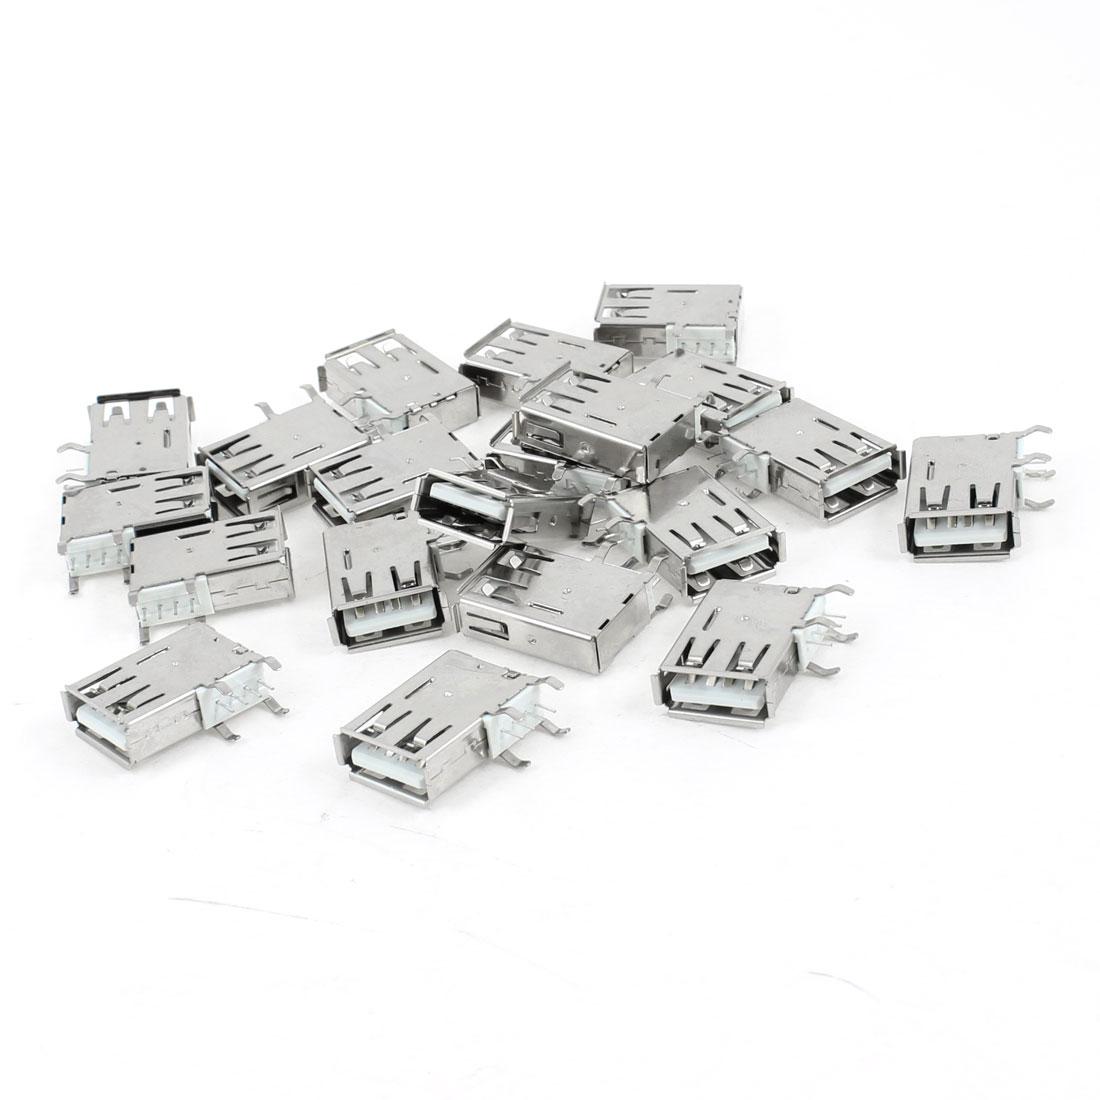 20 Pcs USB 2.0 Type A Female Side DIP 90 Degree 4-Pin Jack Socket